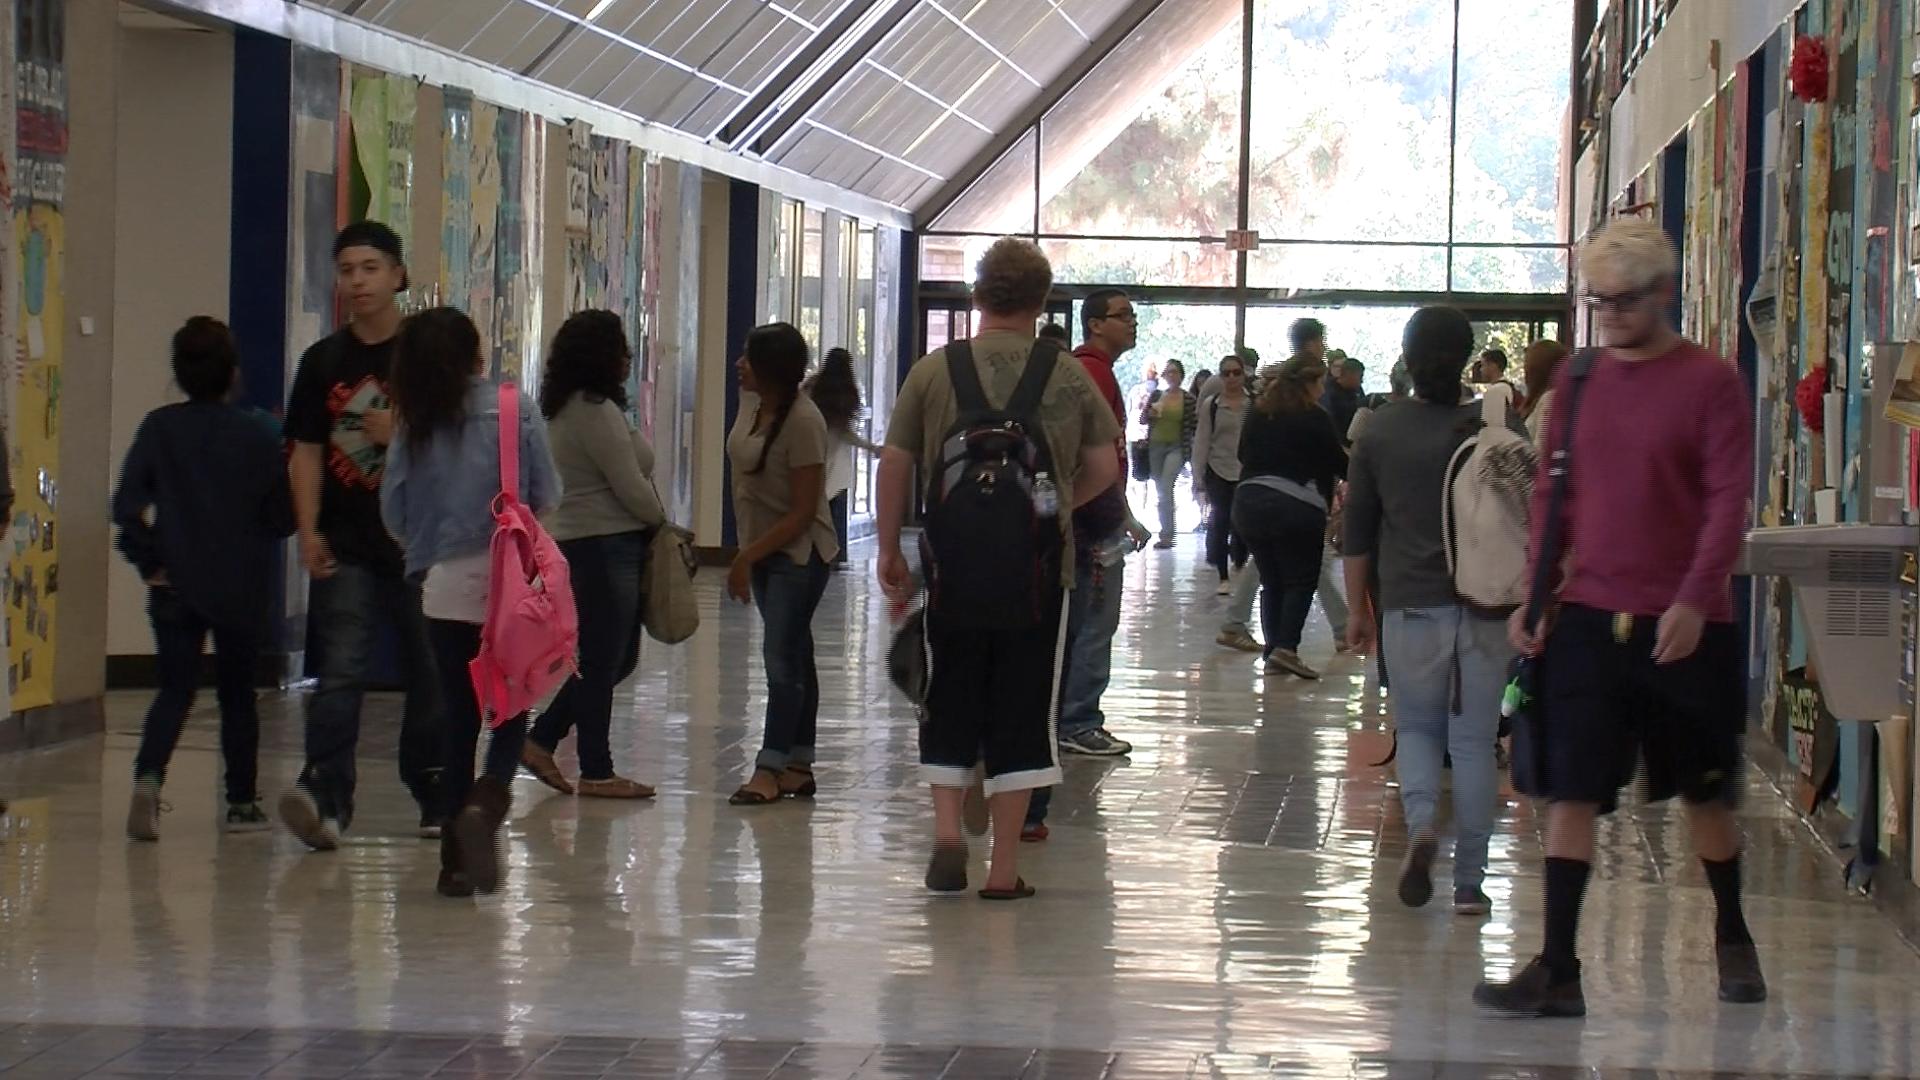 CSUB Campus Population Forces University to Respond